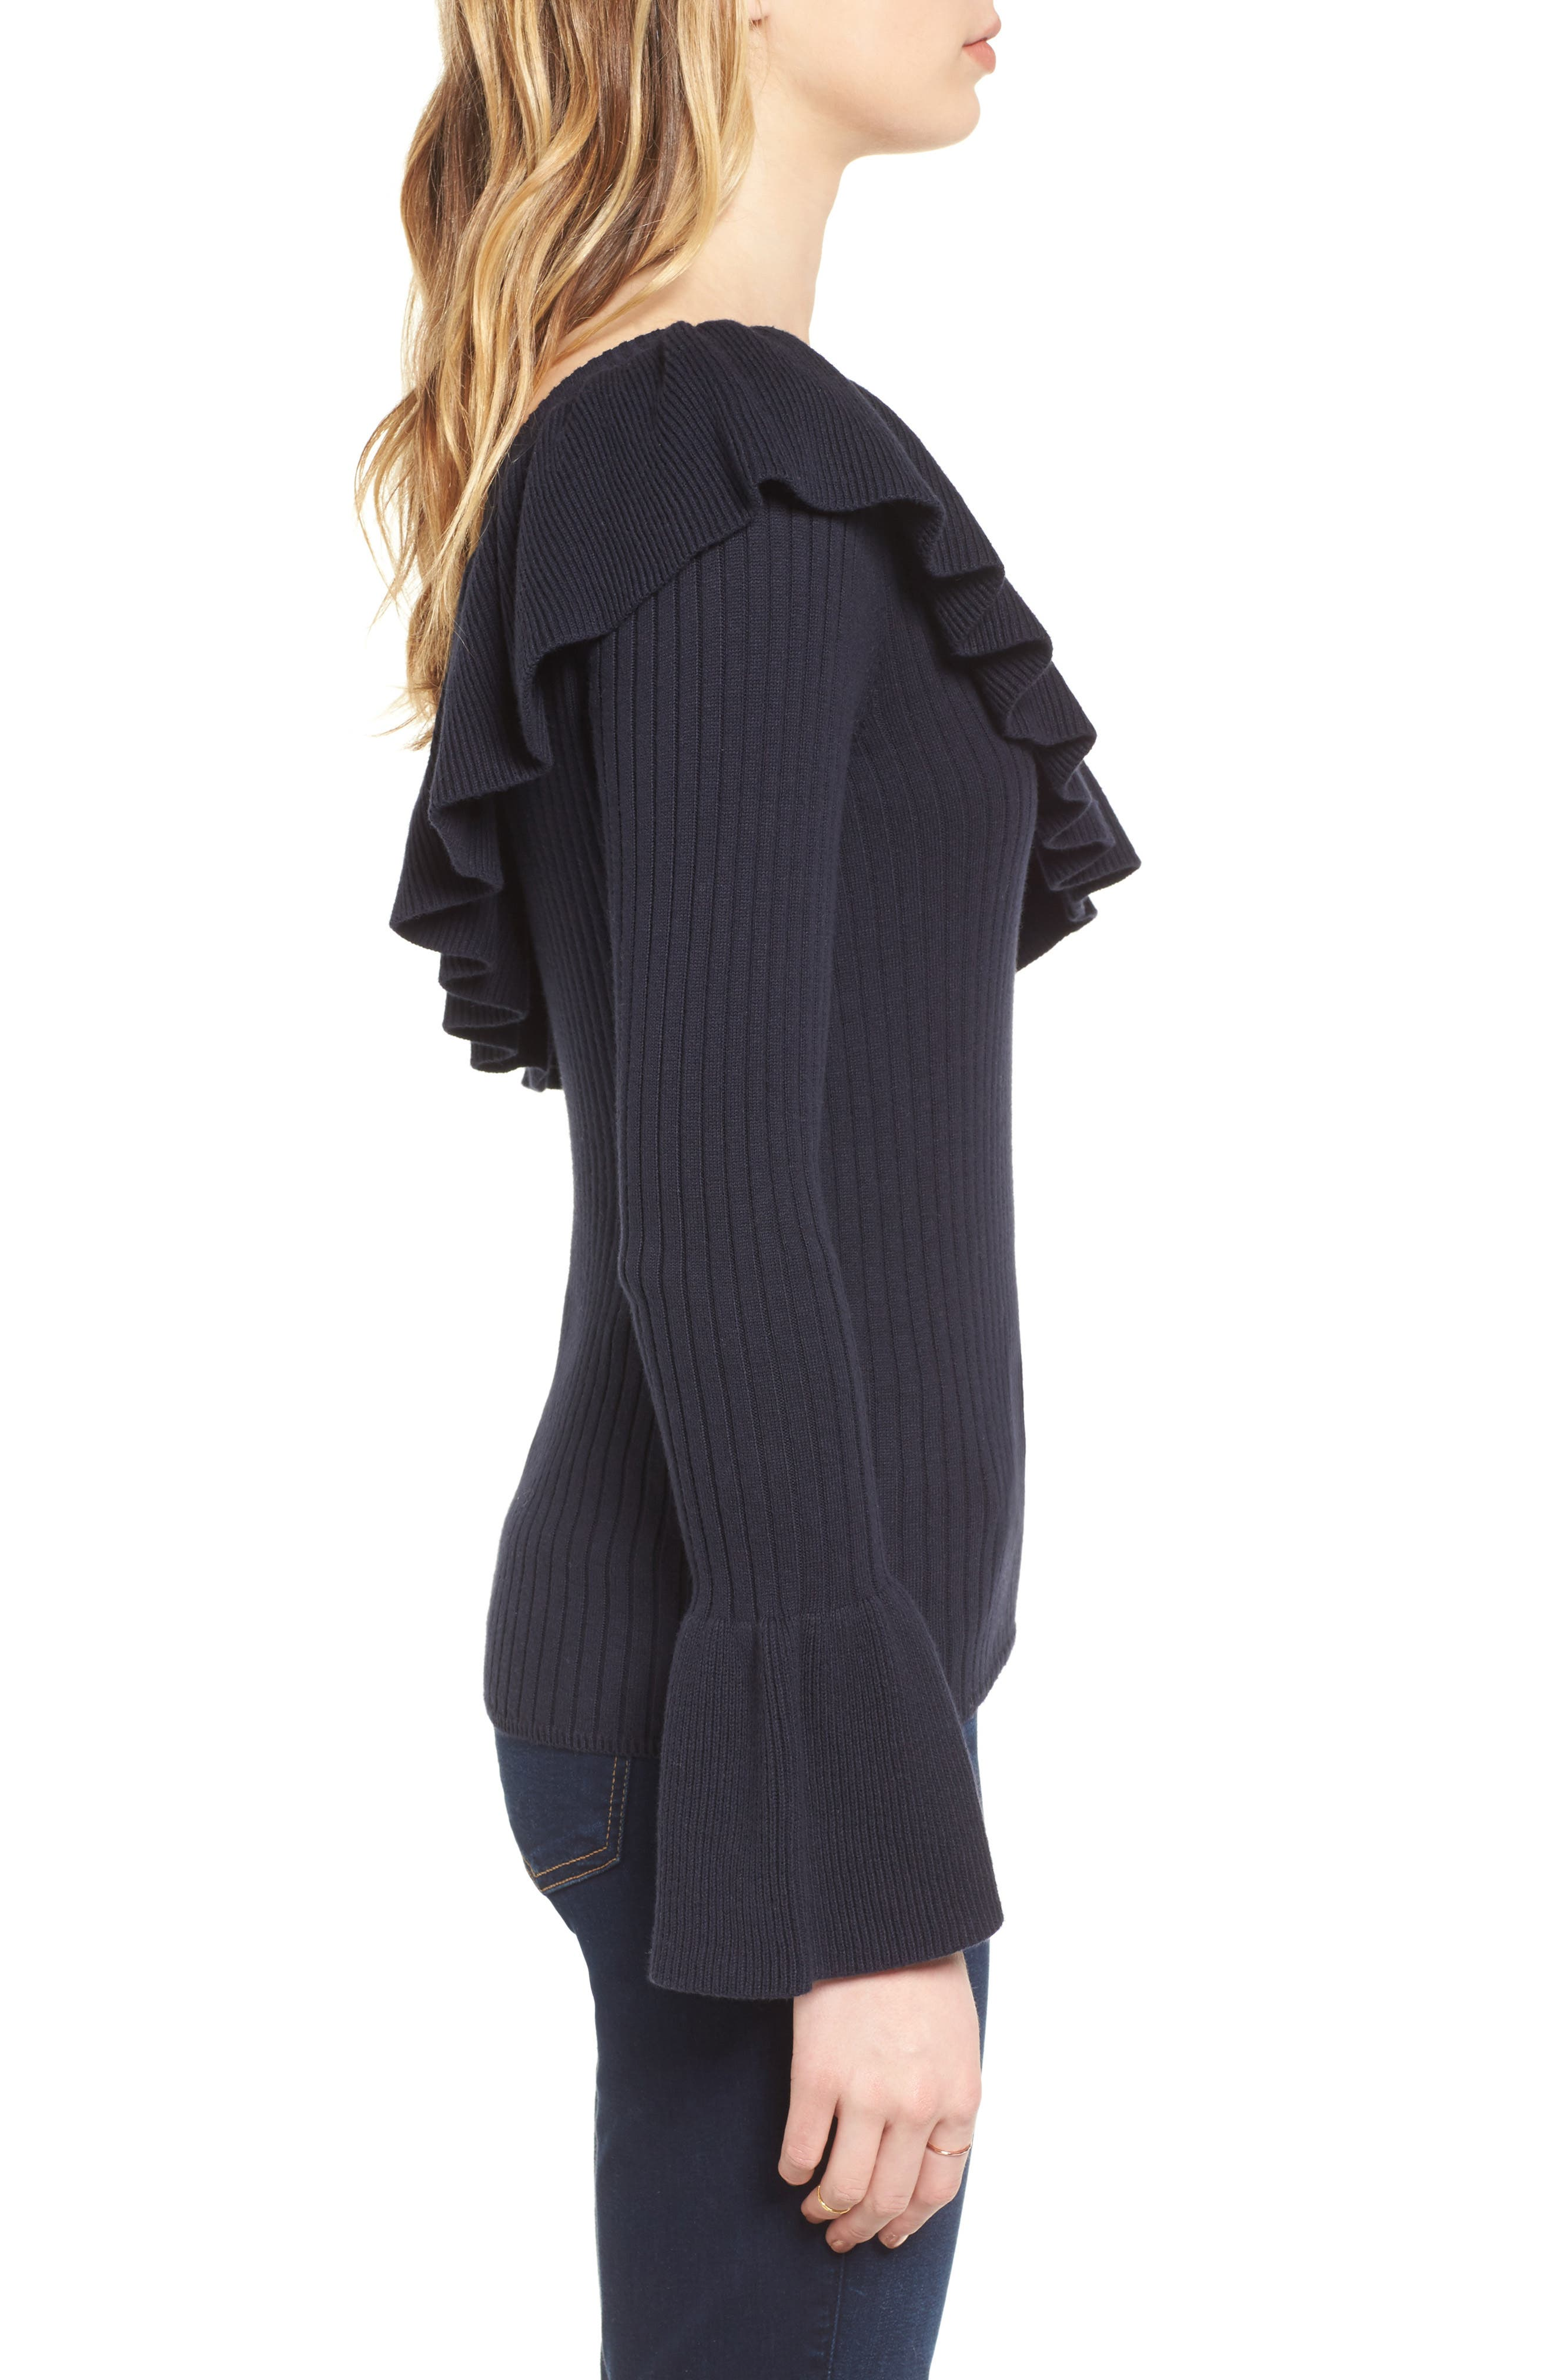 Ava One Shoulder Cotton & Cashmere Sweater,                             Alternate thumbnail 3, color,                             Navy